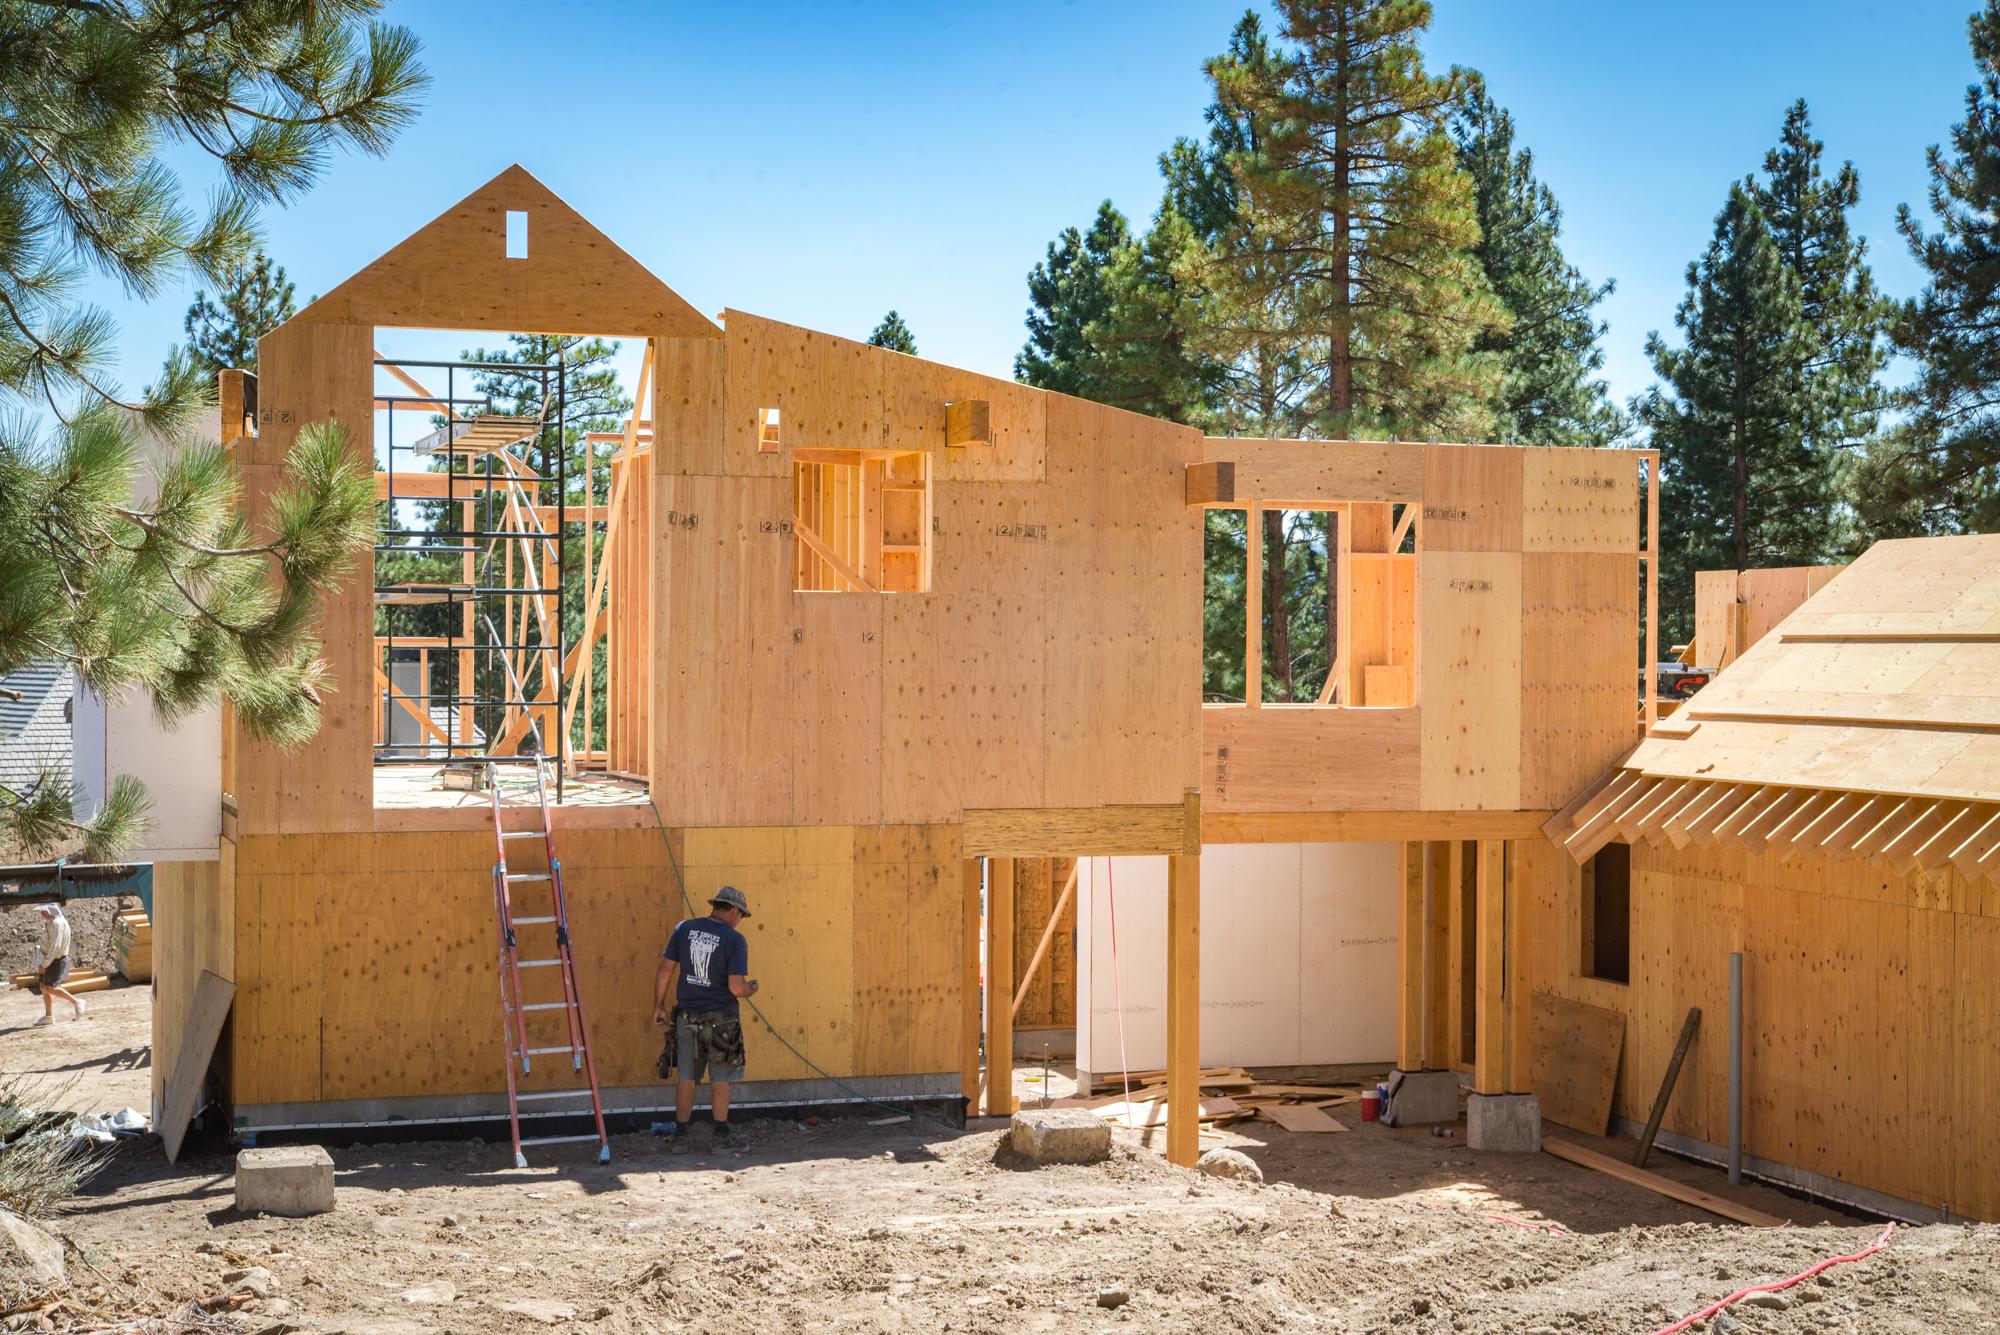 Montreux New Home Construction and Interior Design - Reno, Nevada - Kovac Design